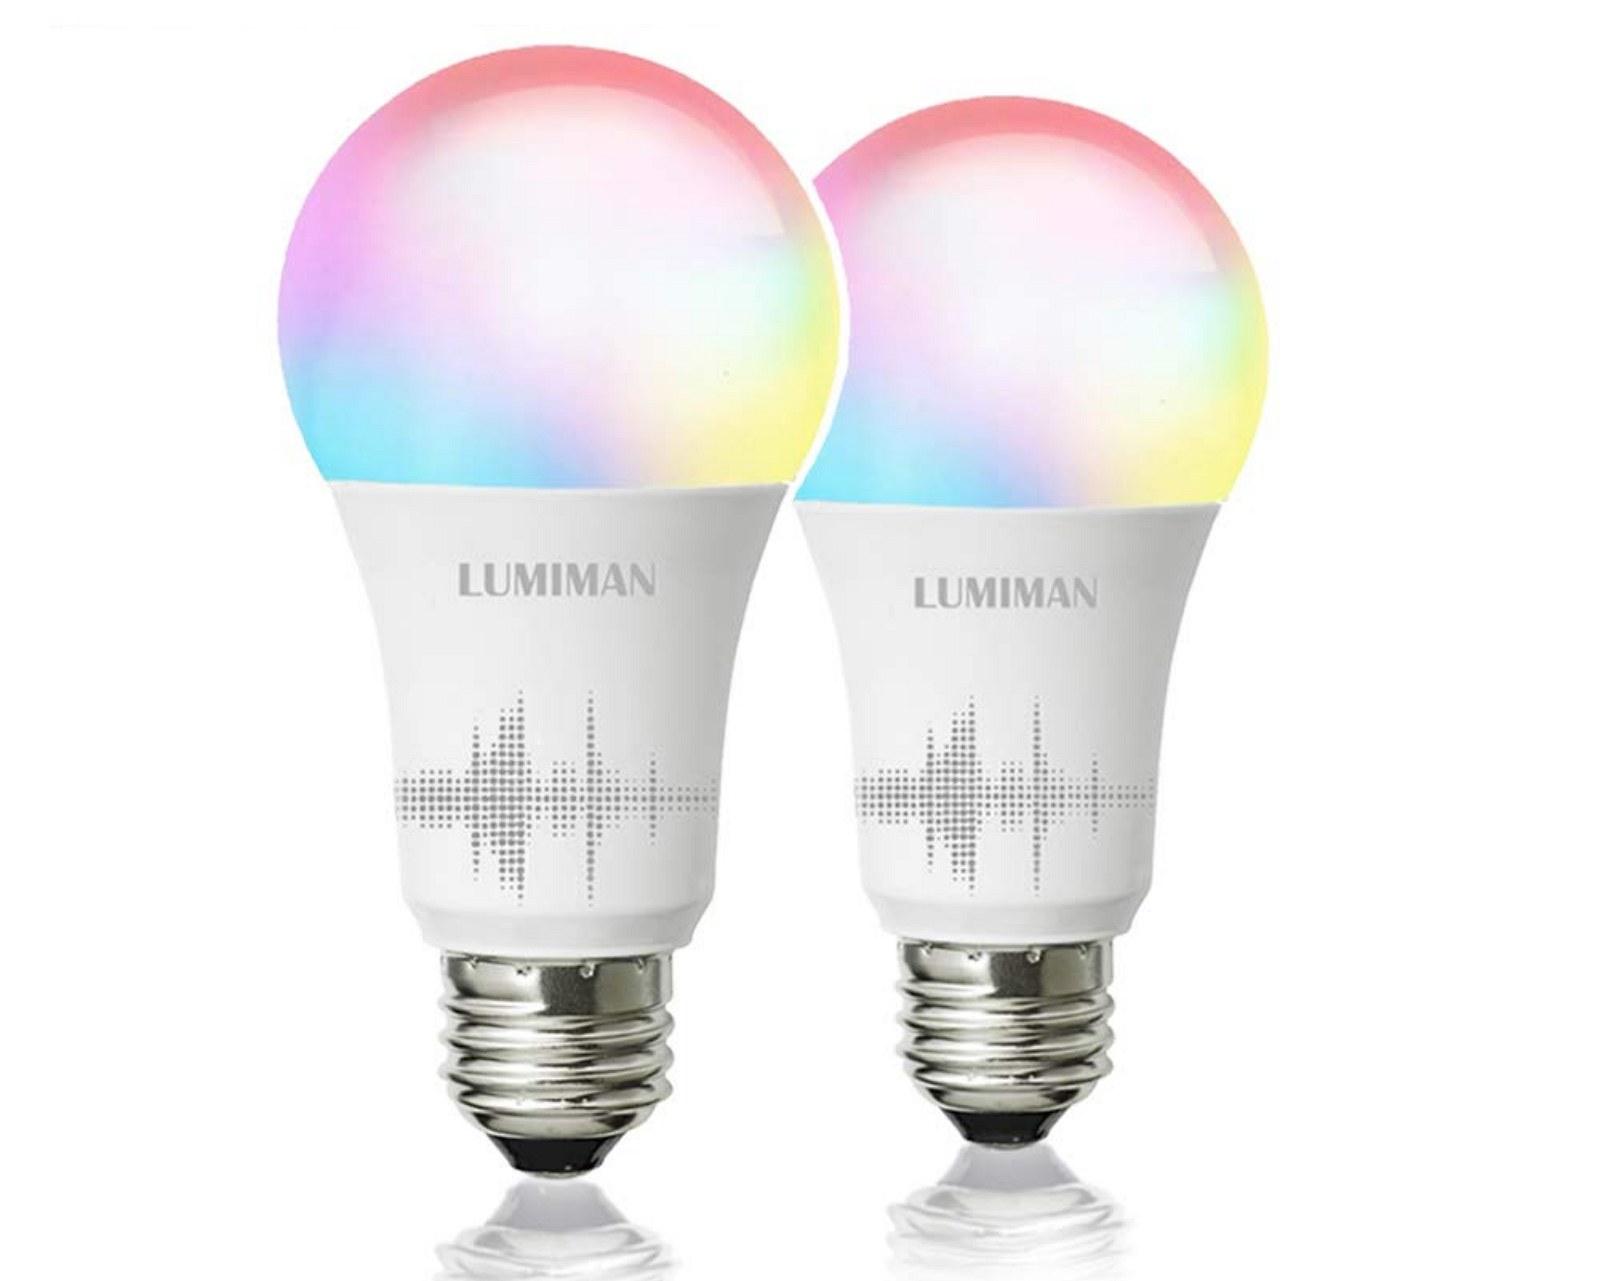 Lumiman RGB WiFi LED light bulbs